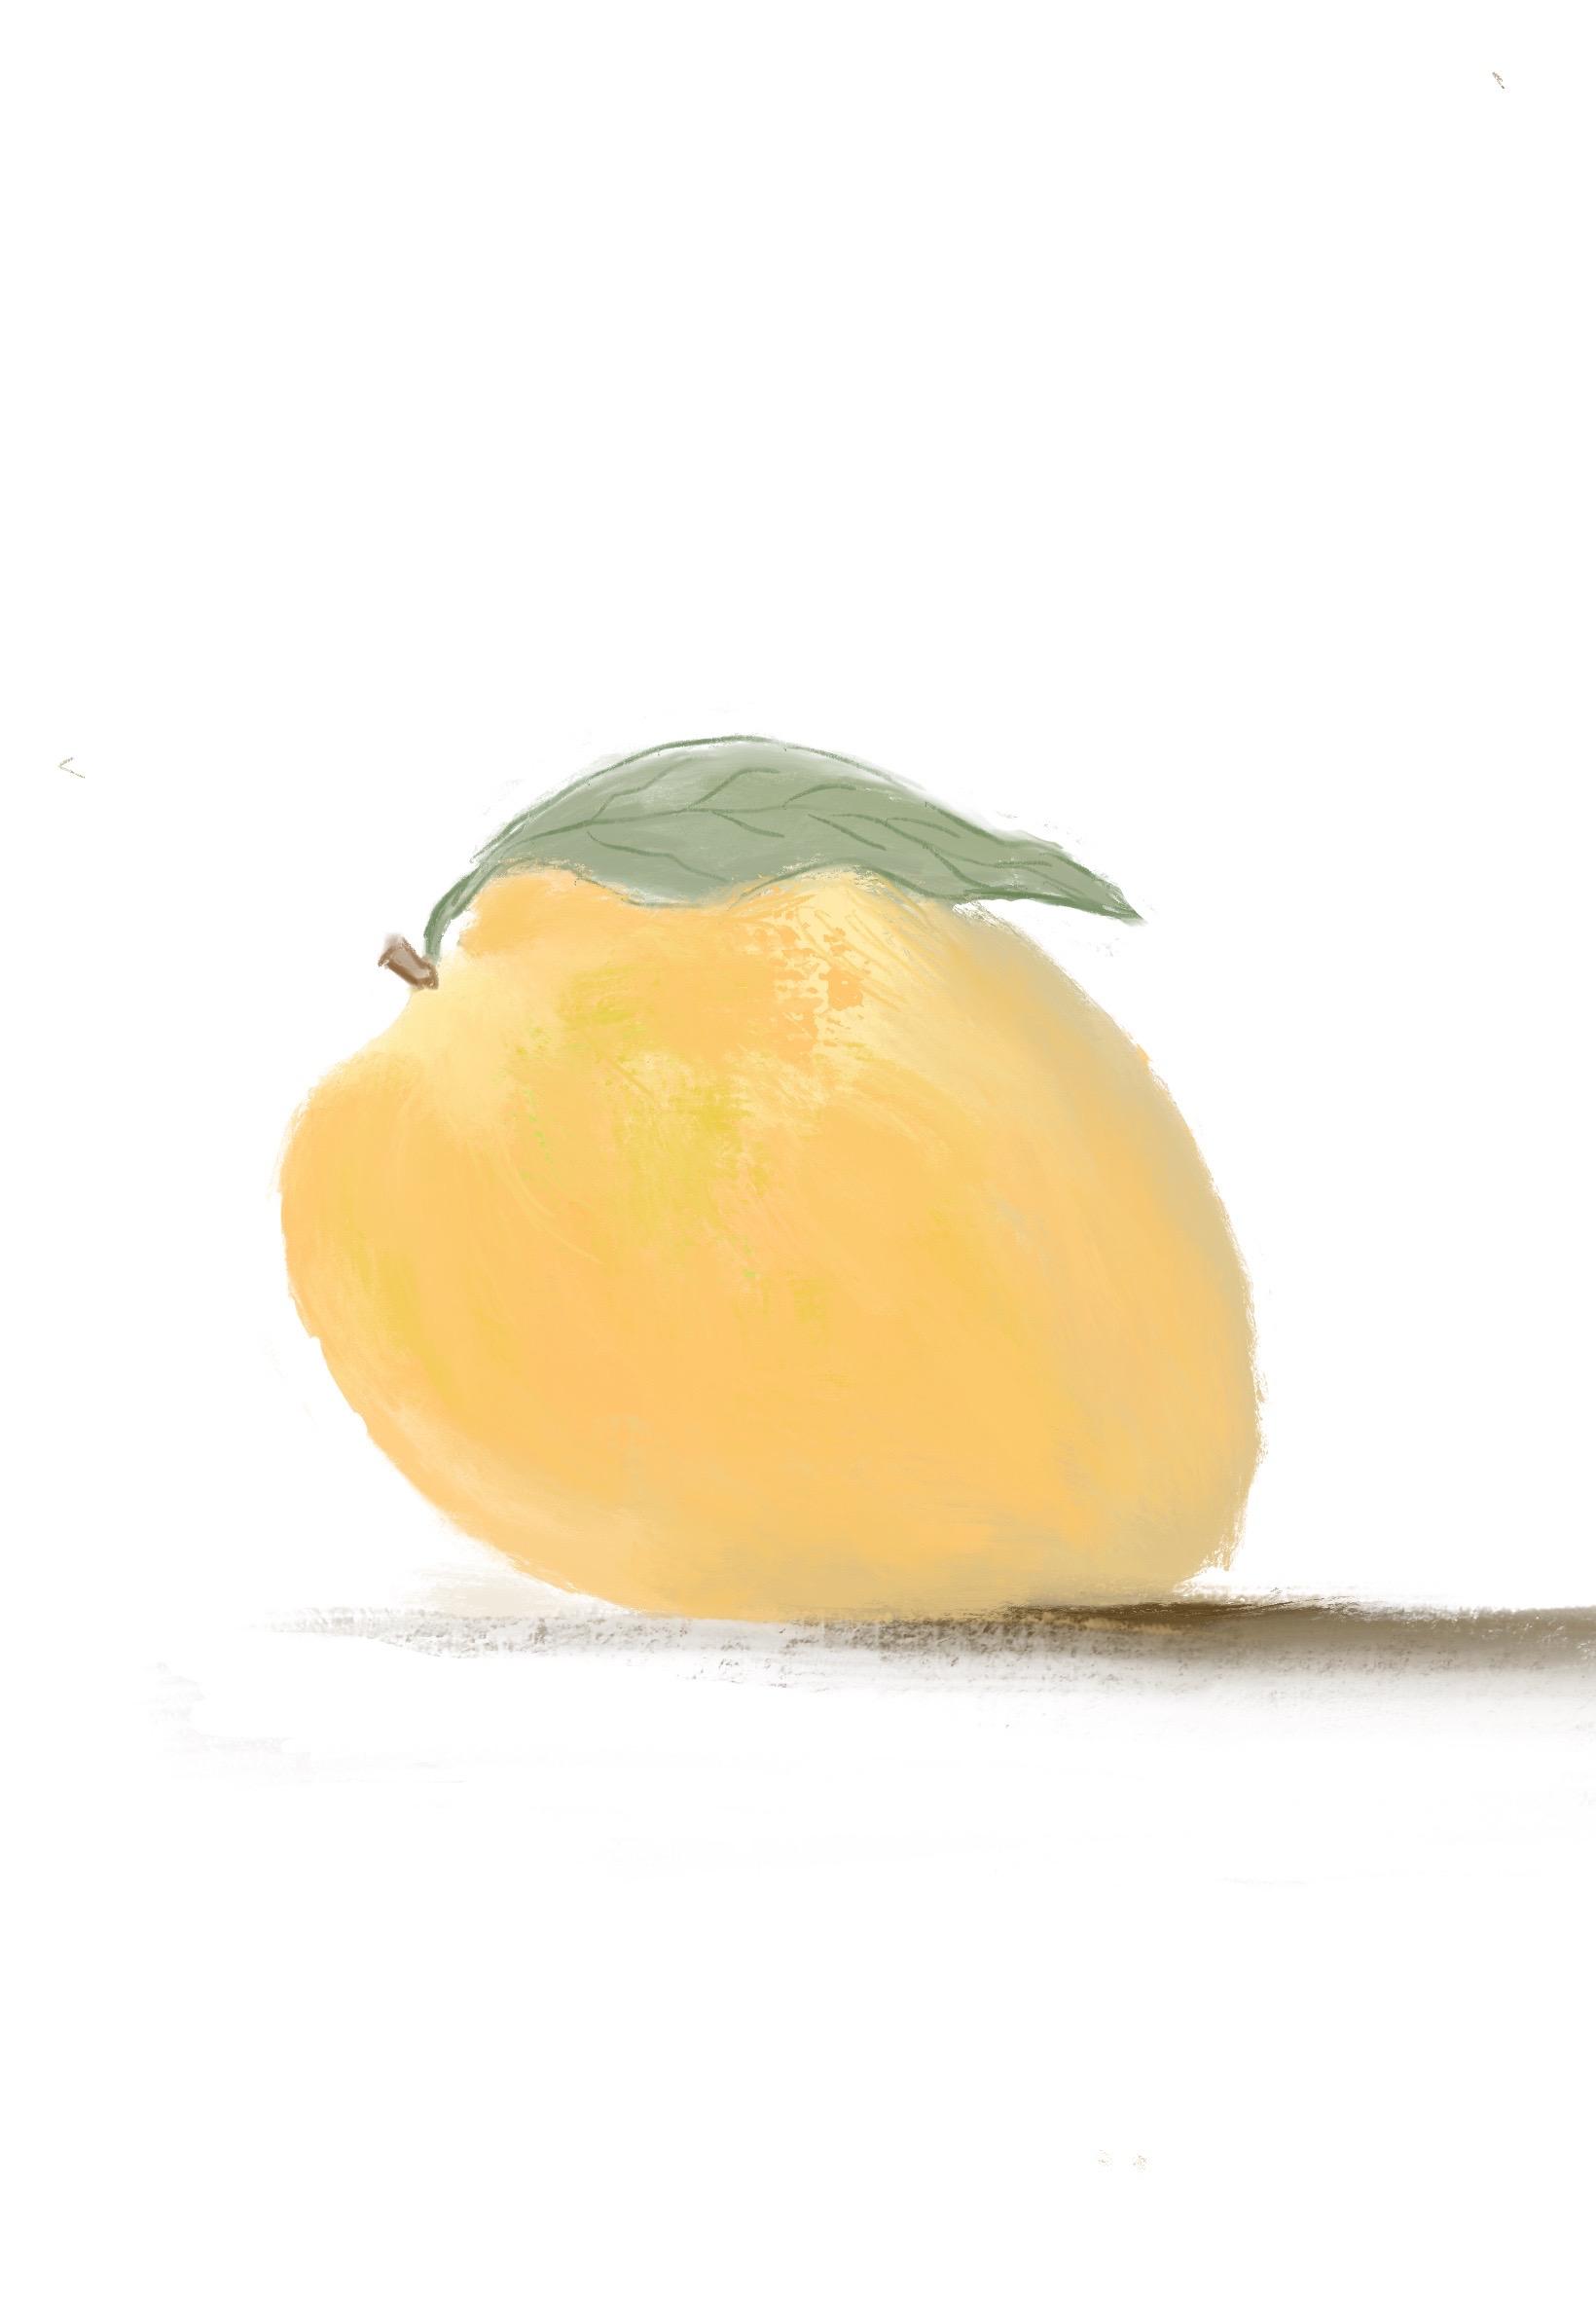 A mangoe